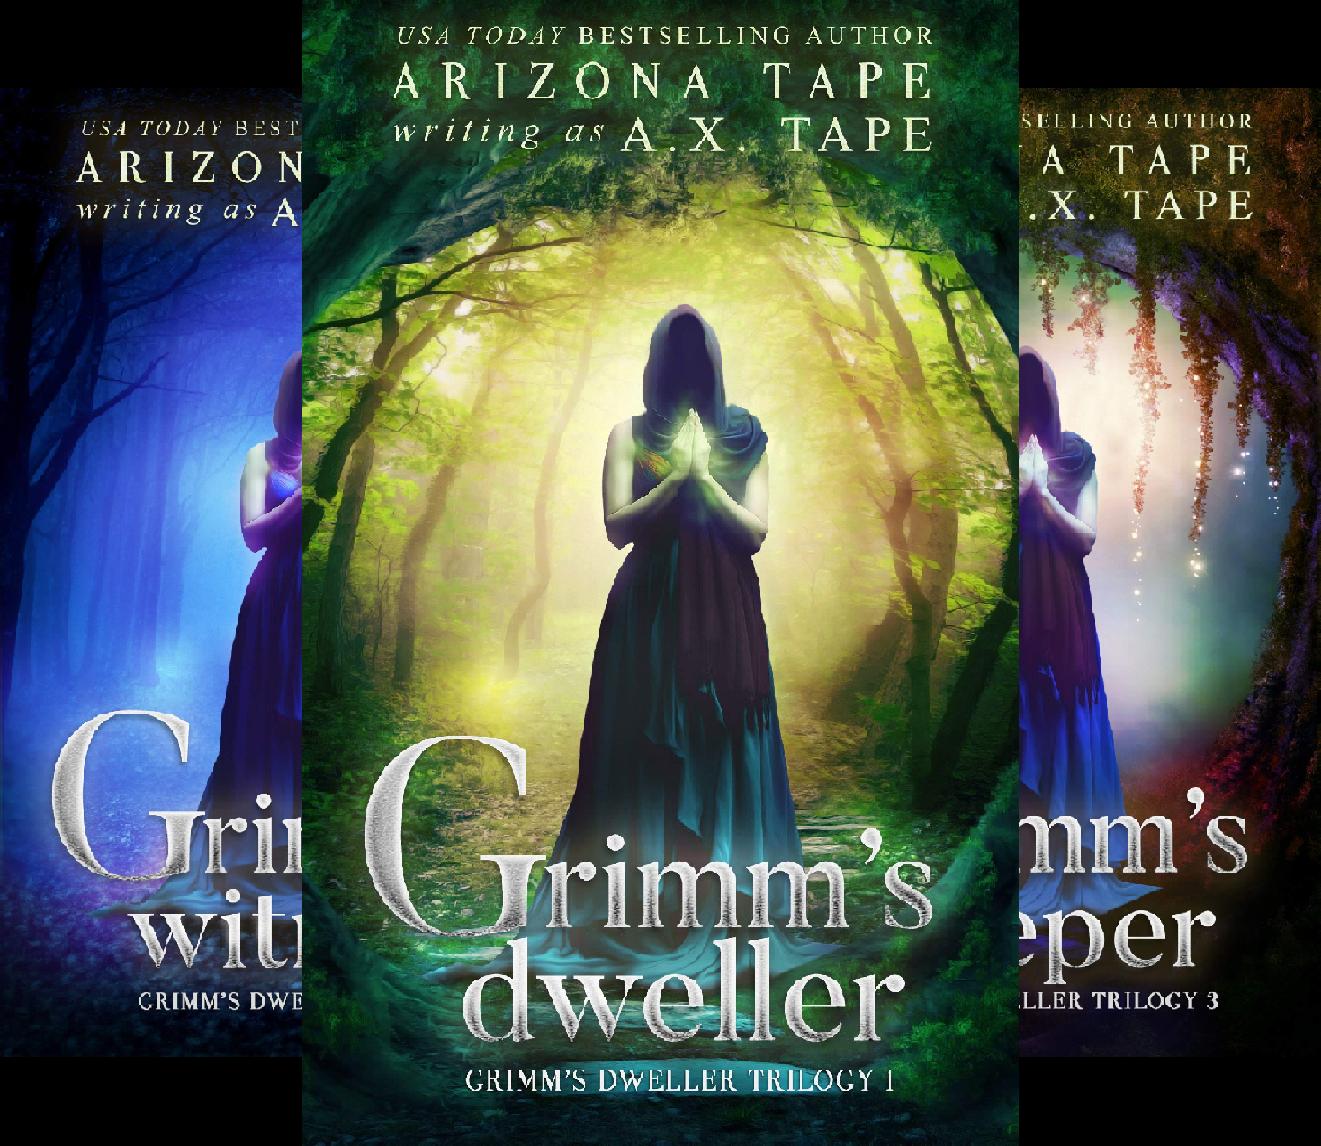 Grimm's Dweller Series (3 Book Series)